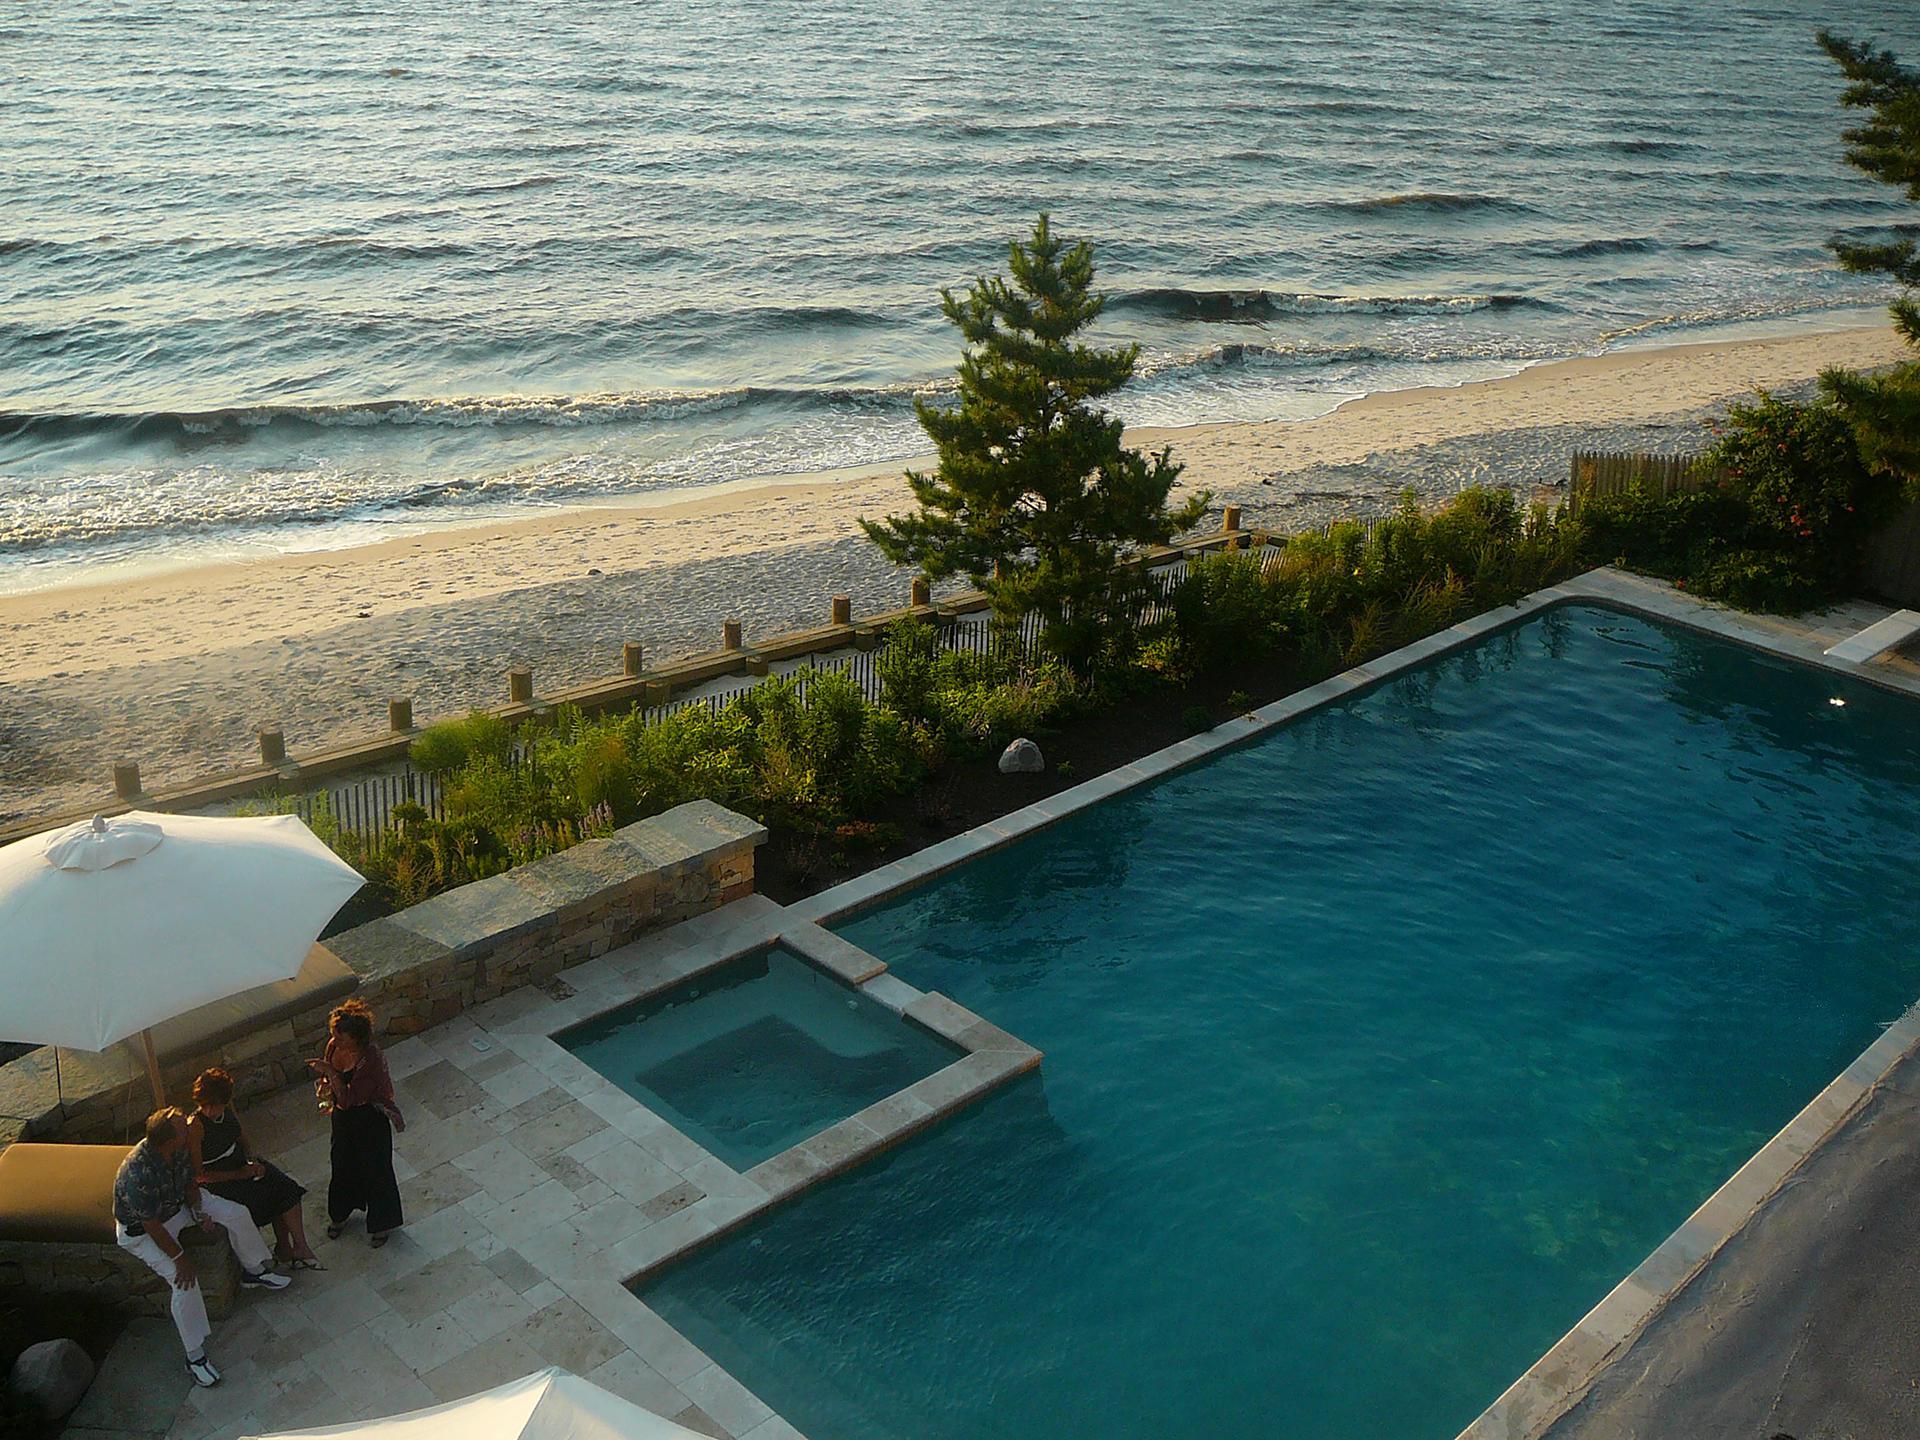 beachfront-landscape-pool-spa-design-jersey-shore-nj